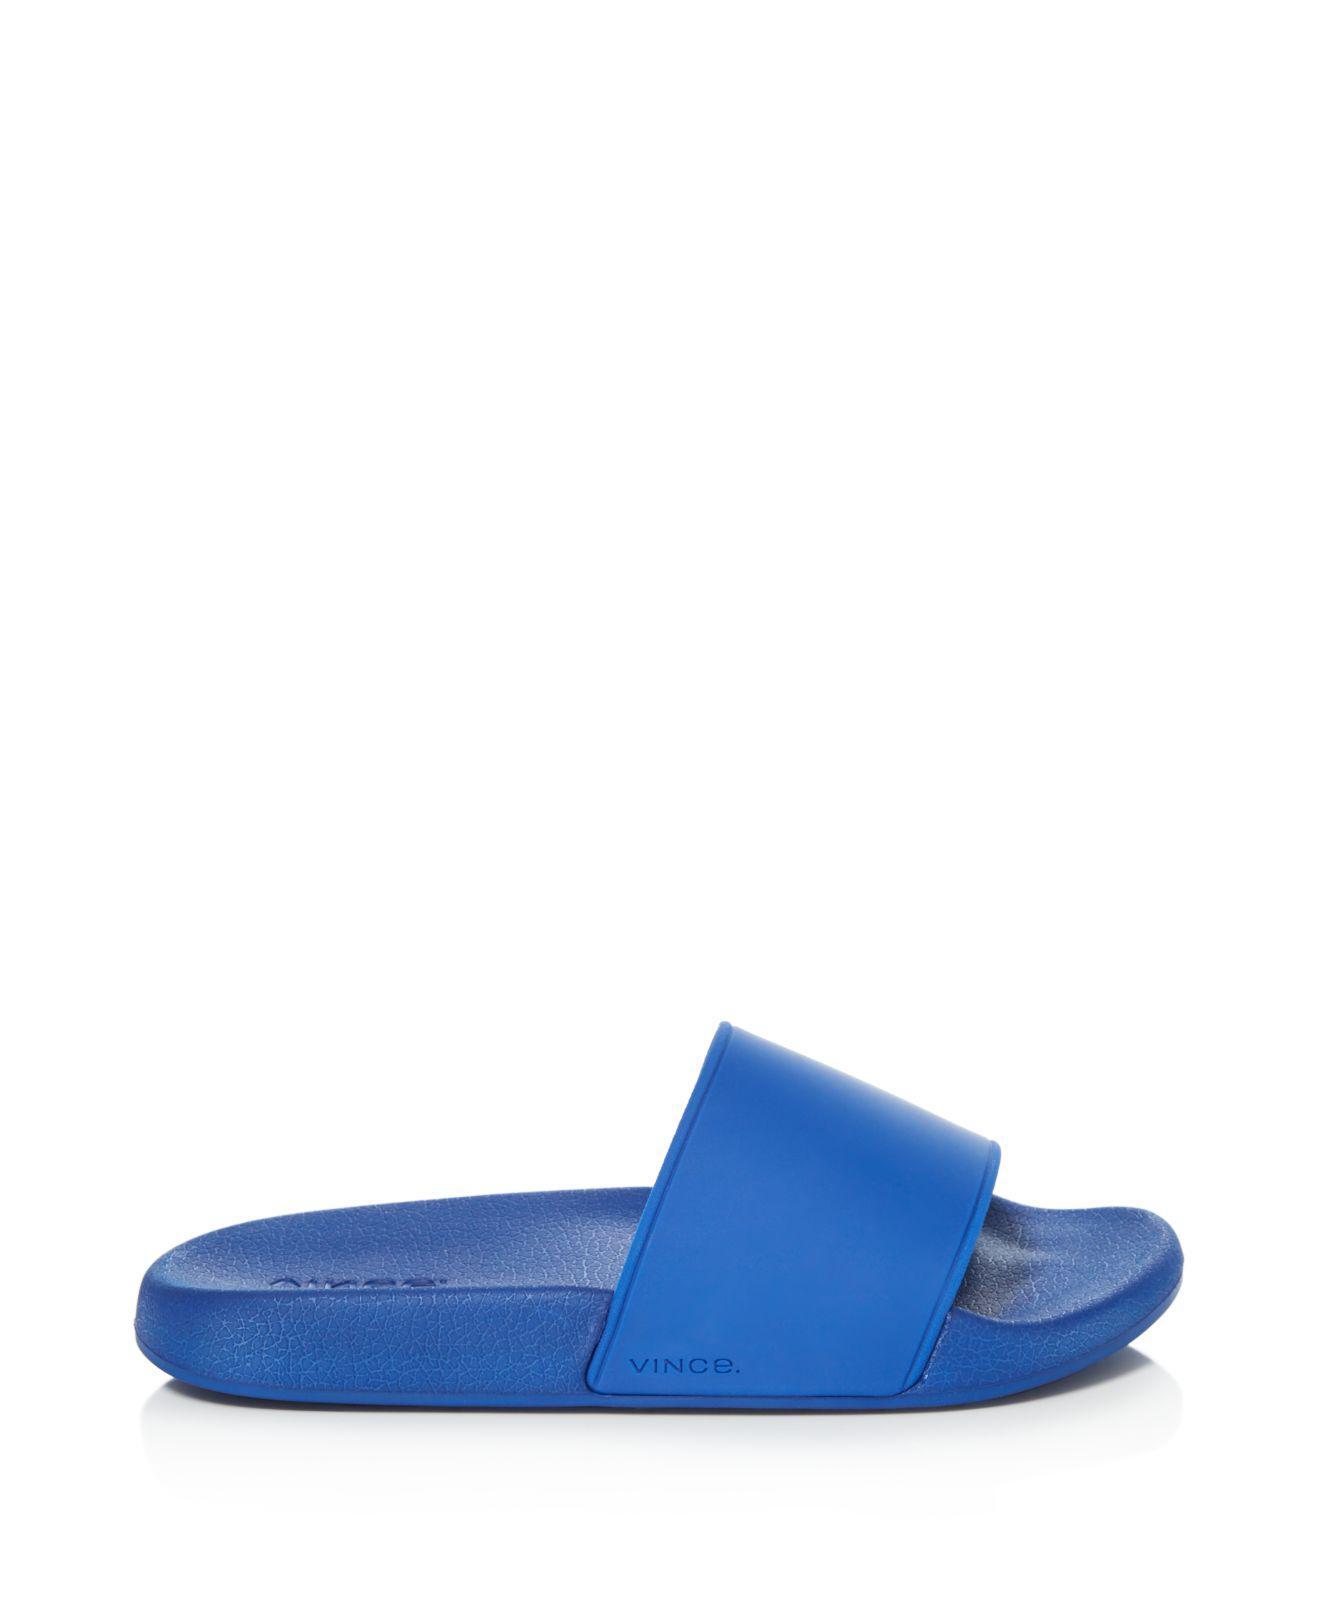 Vince West Coast Pool Slide Sandals In Blue Lyst